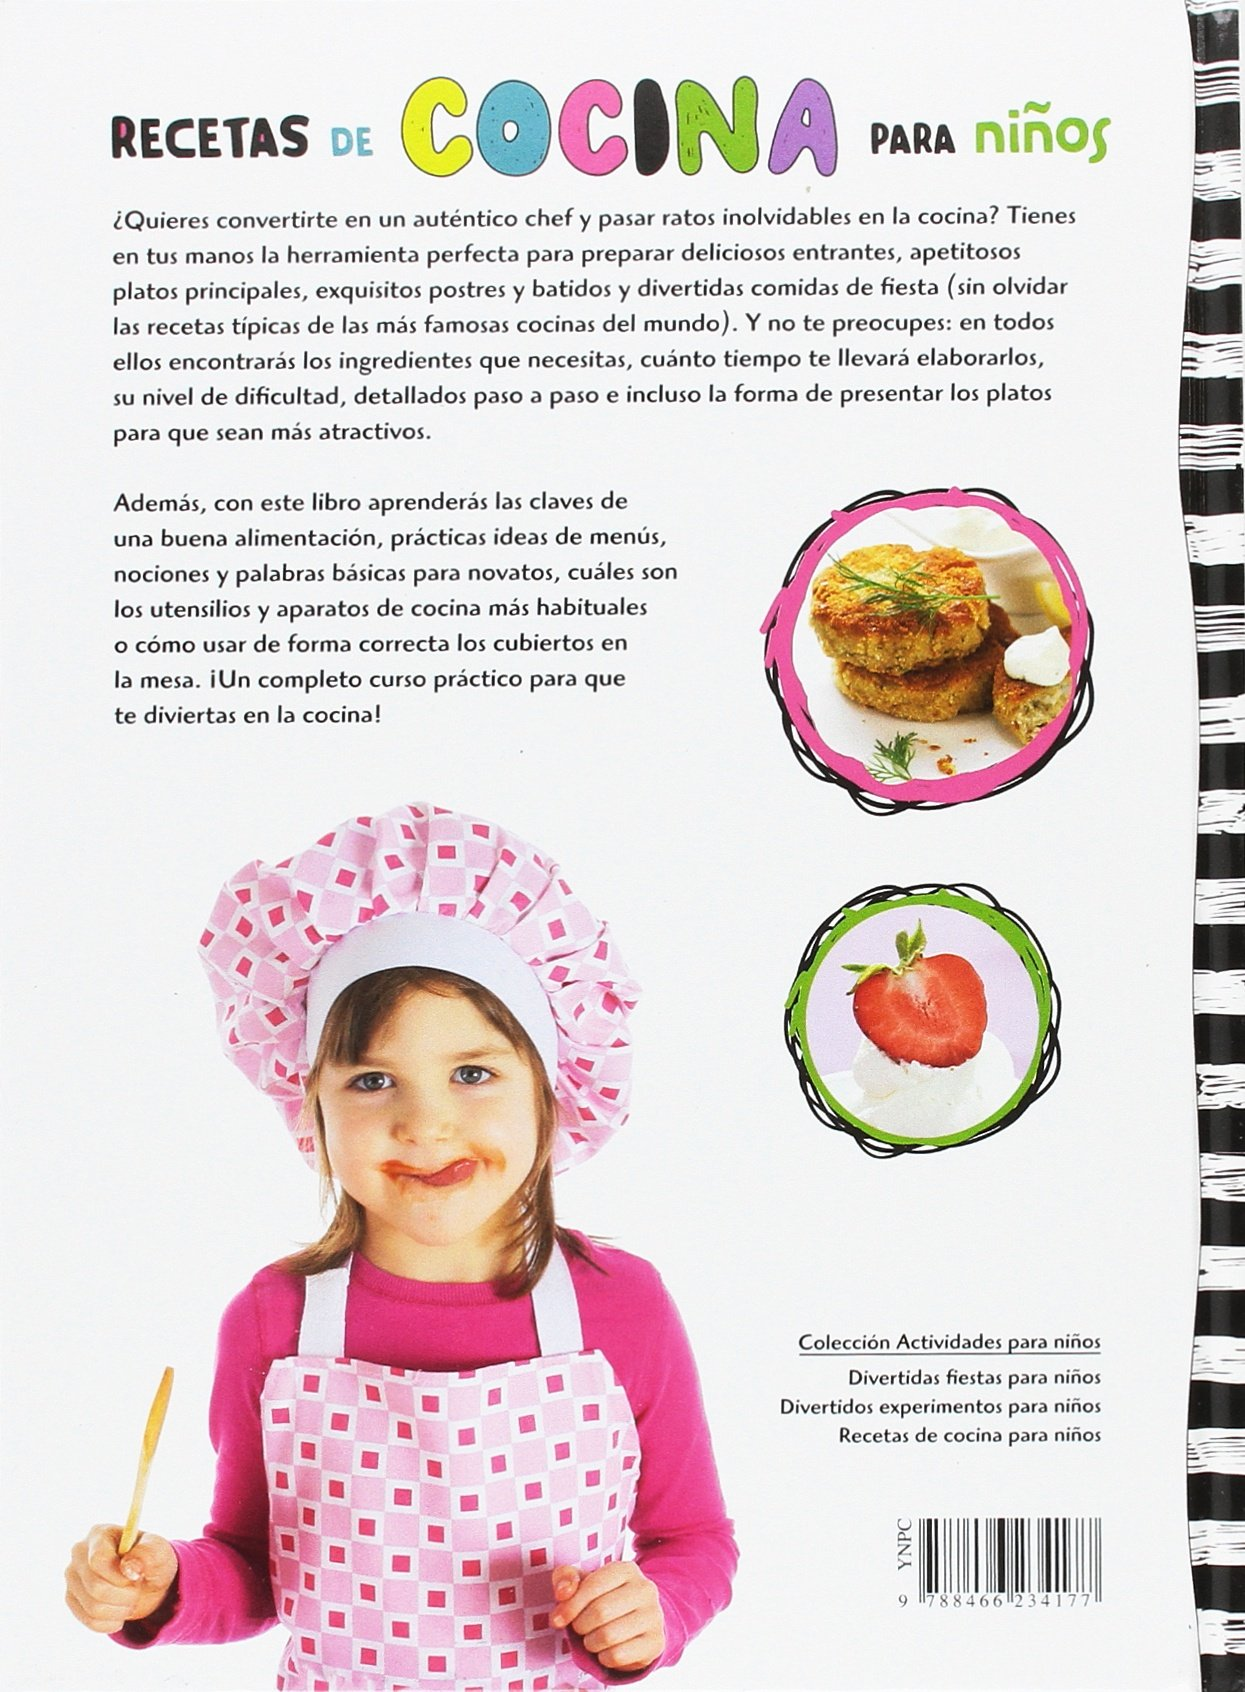 Recetas de Cocina para Niños: CARLA NIETO MARTINEZ: 9788466234177: Amazon.com: Books